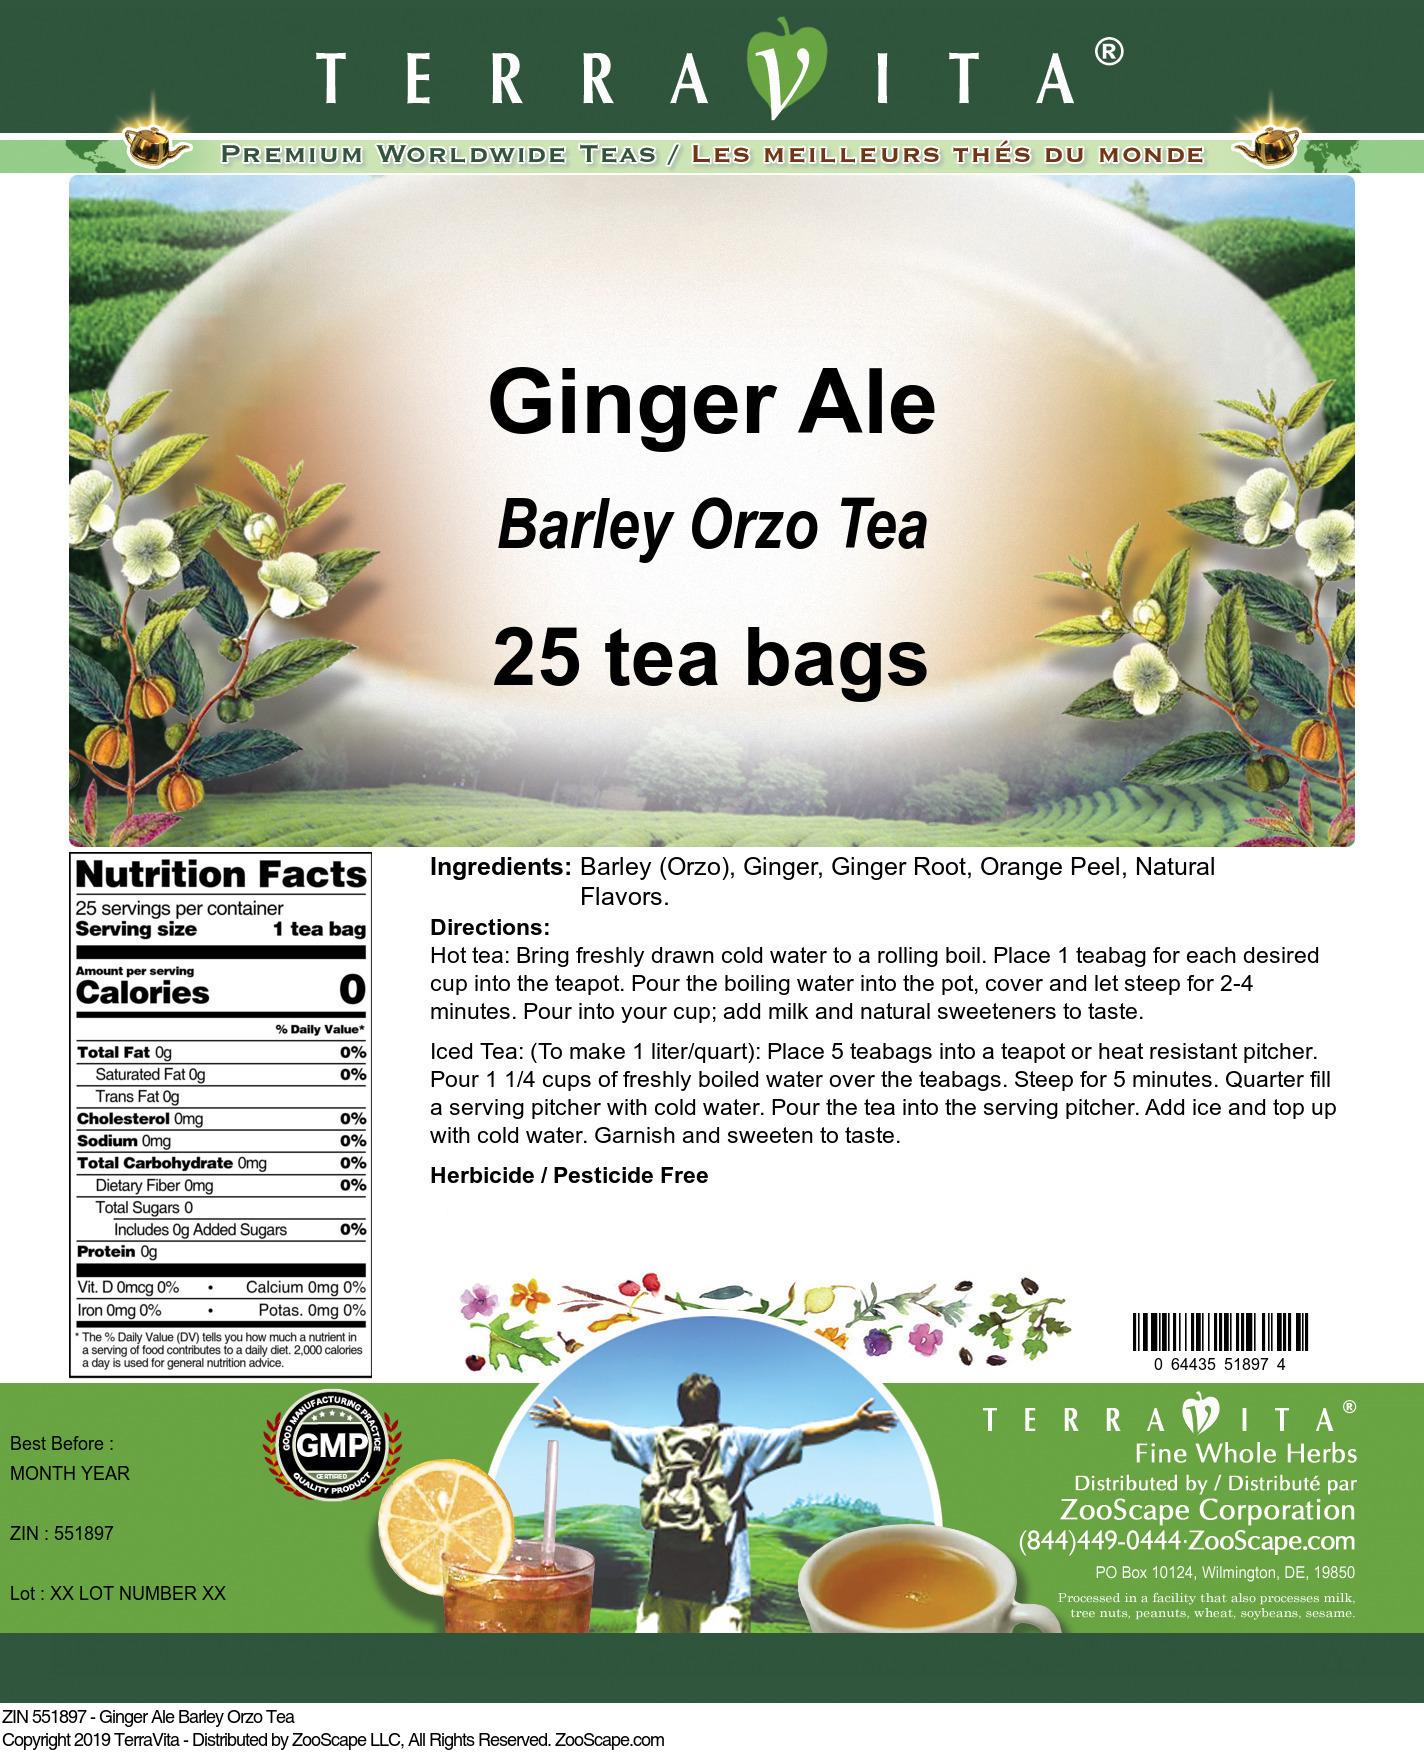 Ginger Ale Barley Orzo Tea